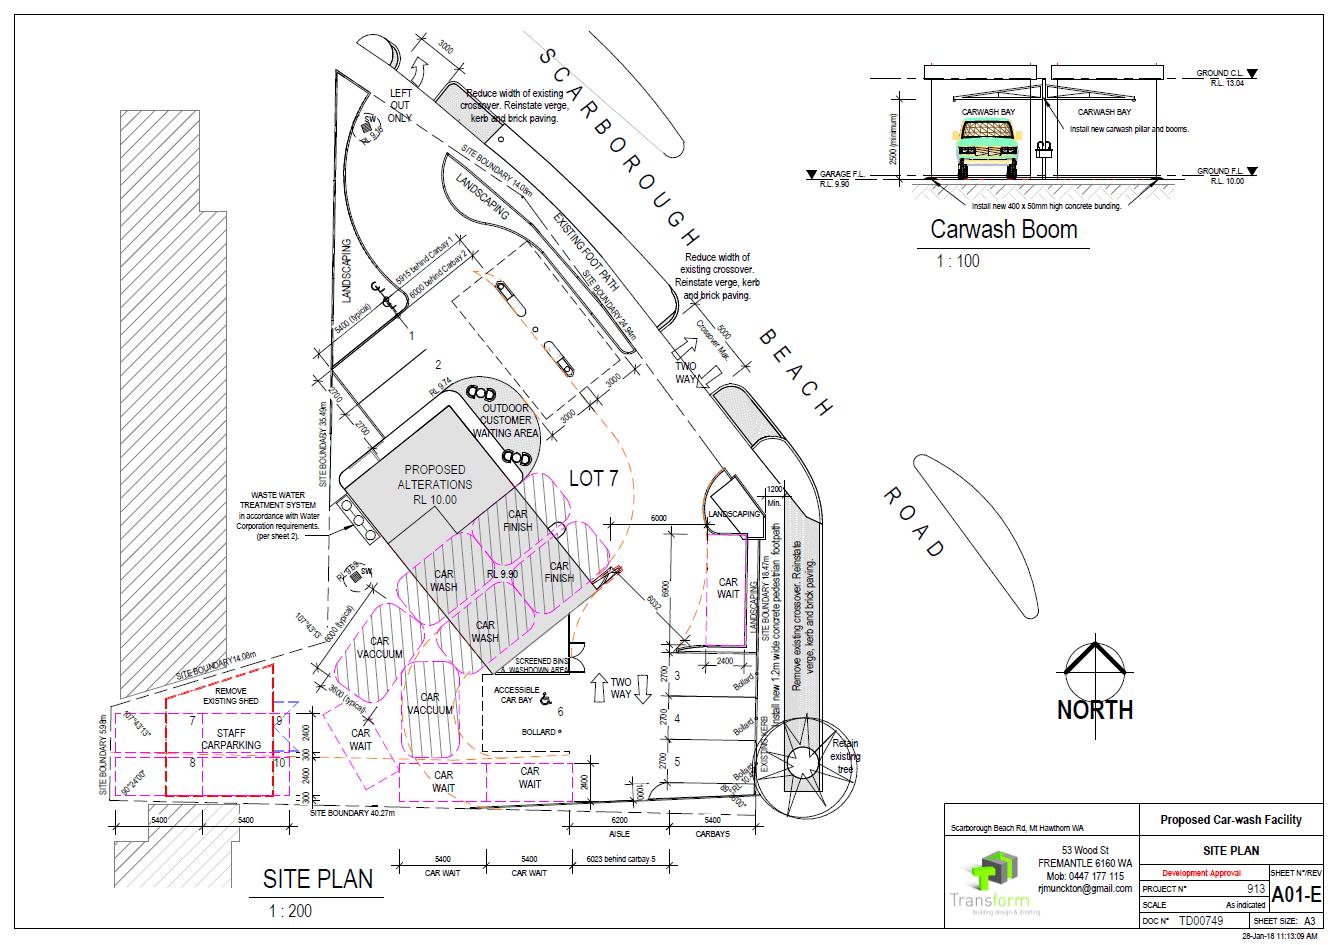 2. Site Plan (2)